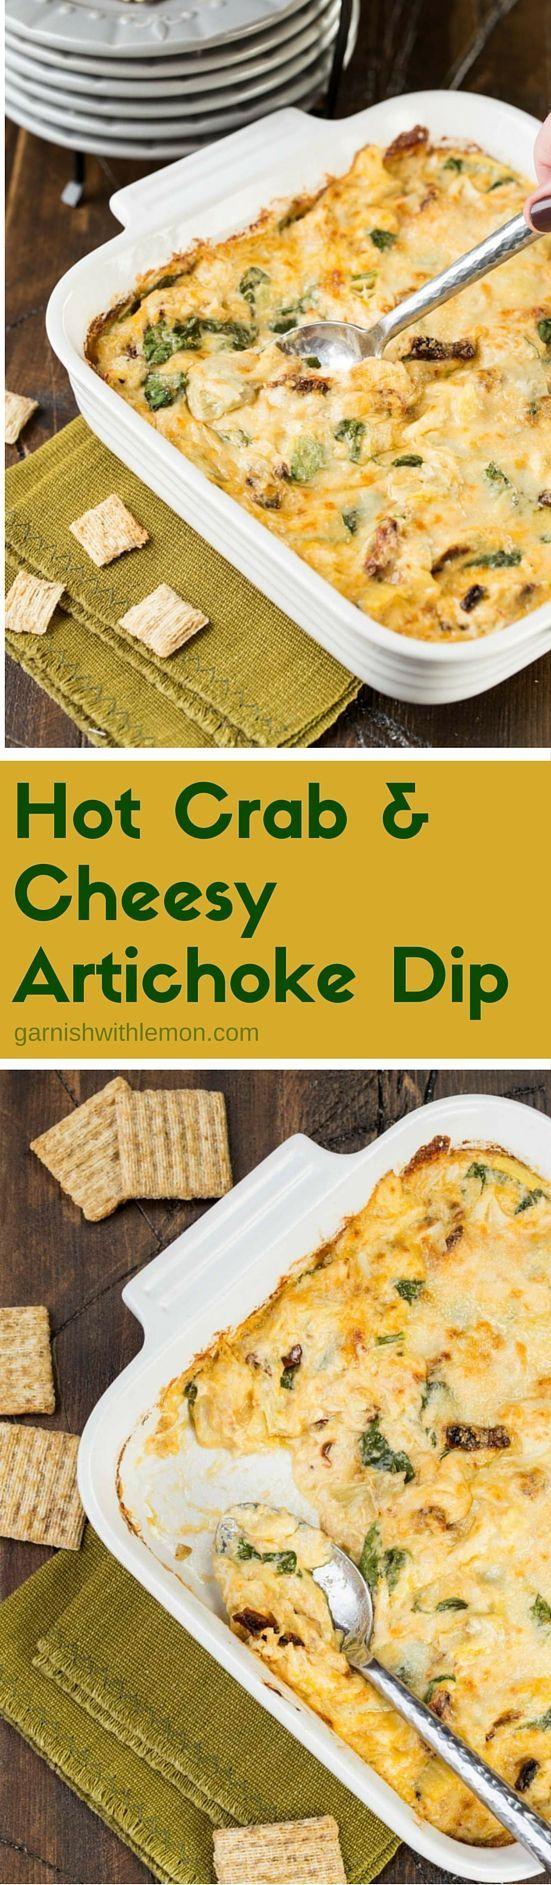 Hot Crab and Cheesy Artichoke Dip | Recipe | The o'jays ...